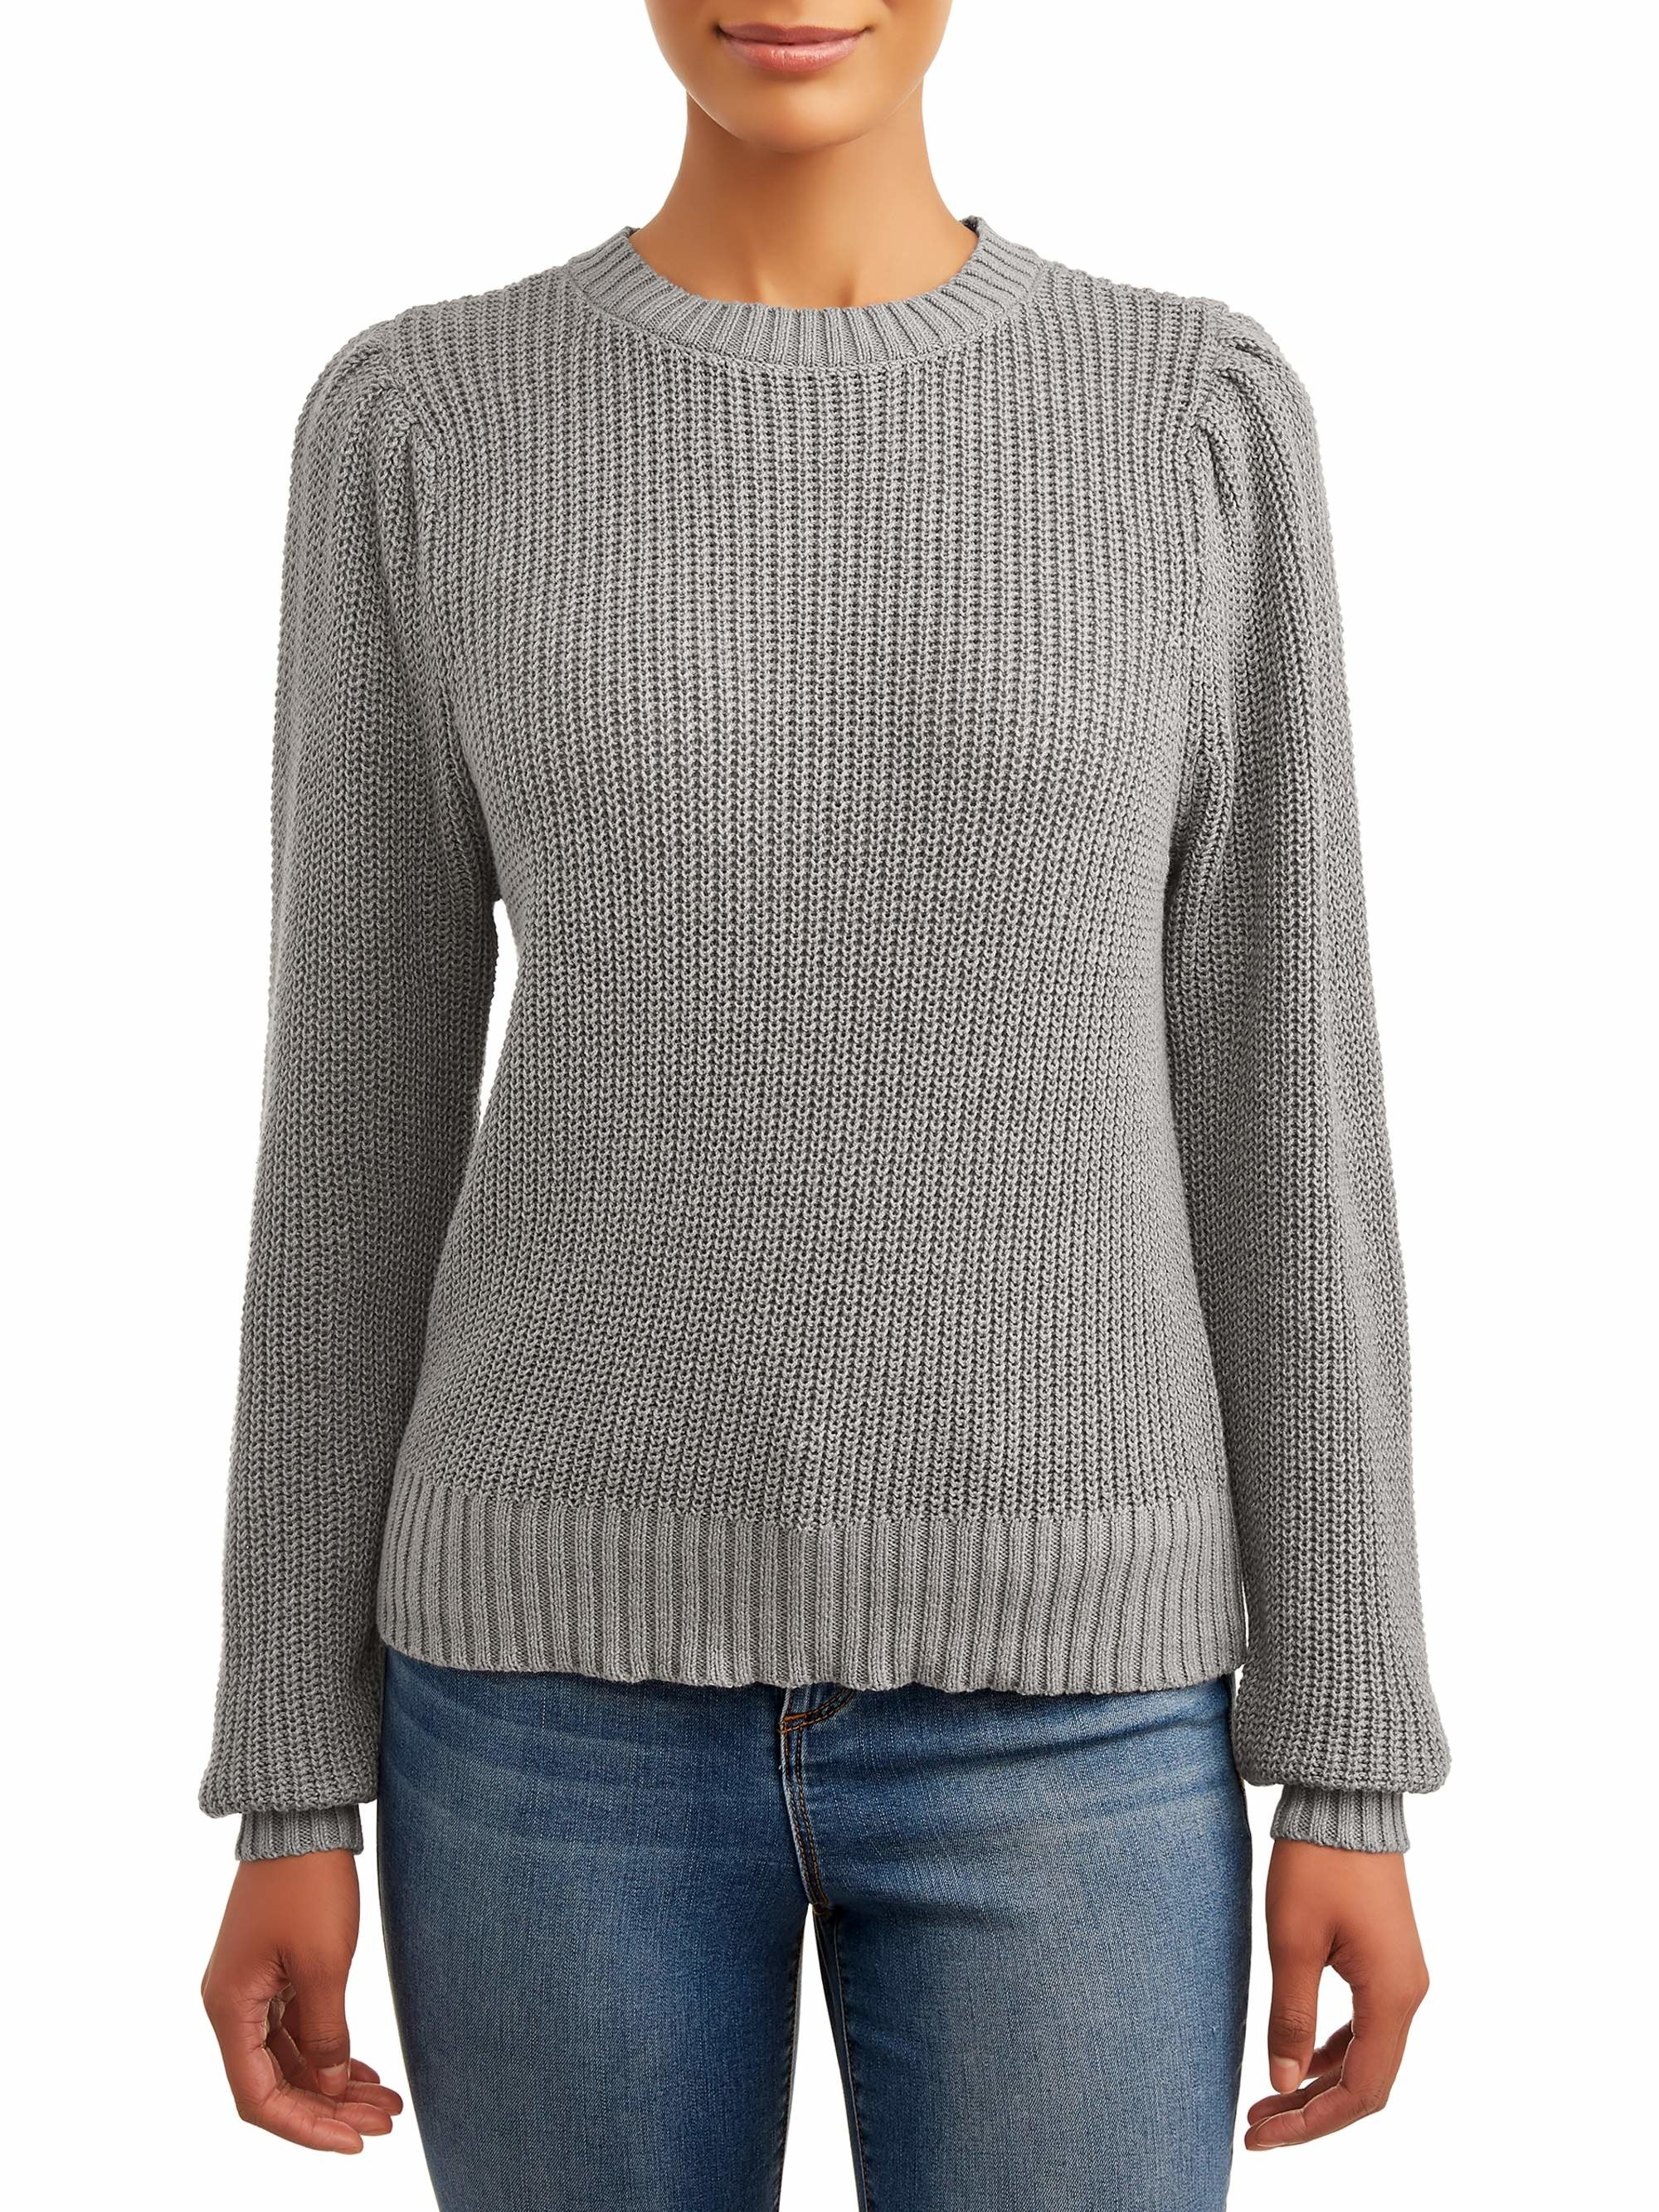 Model wears crewneck in medium grey heather